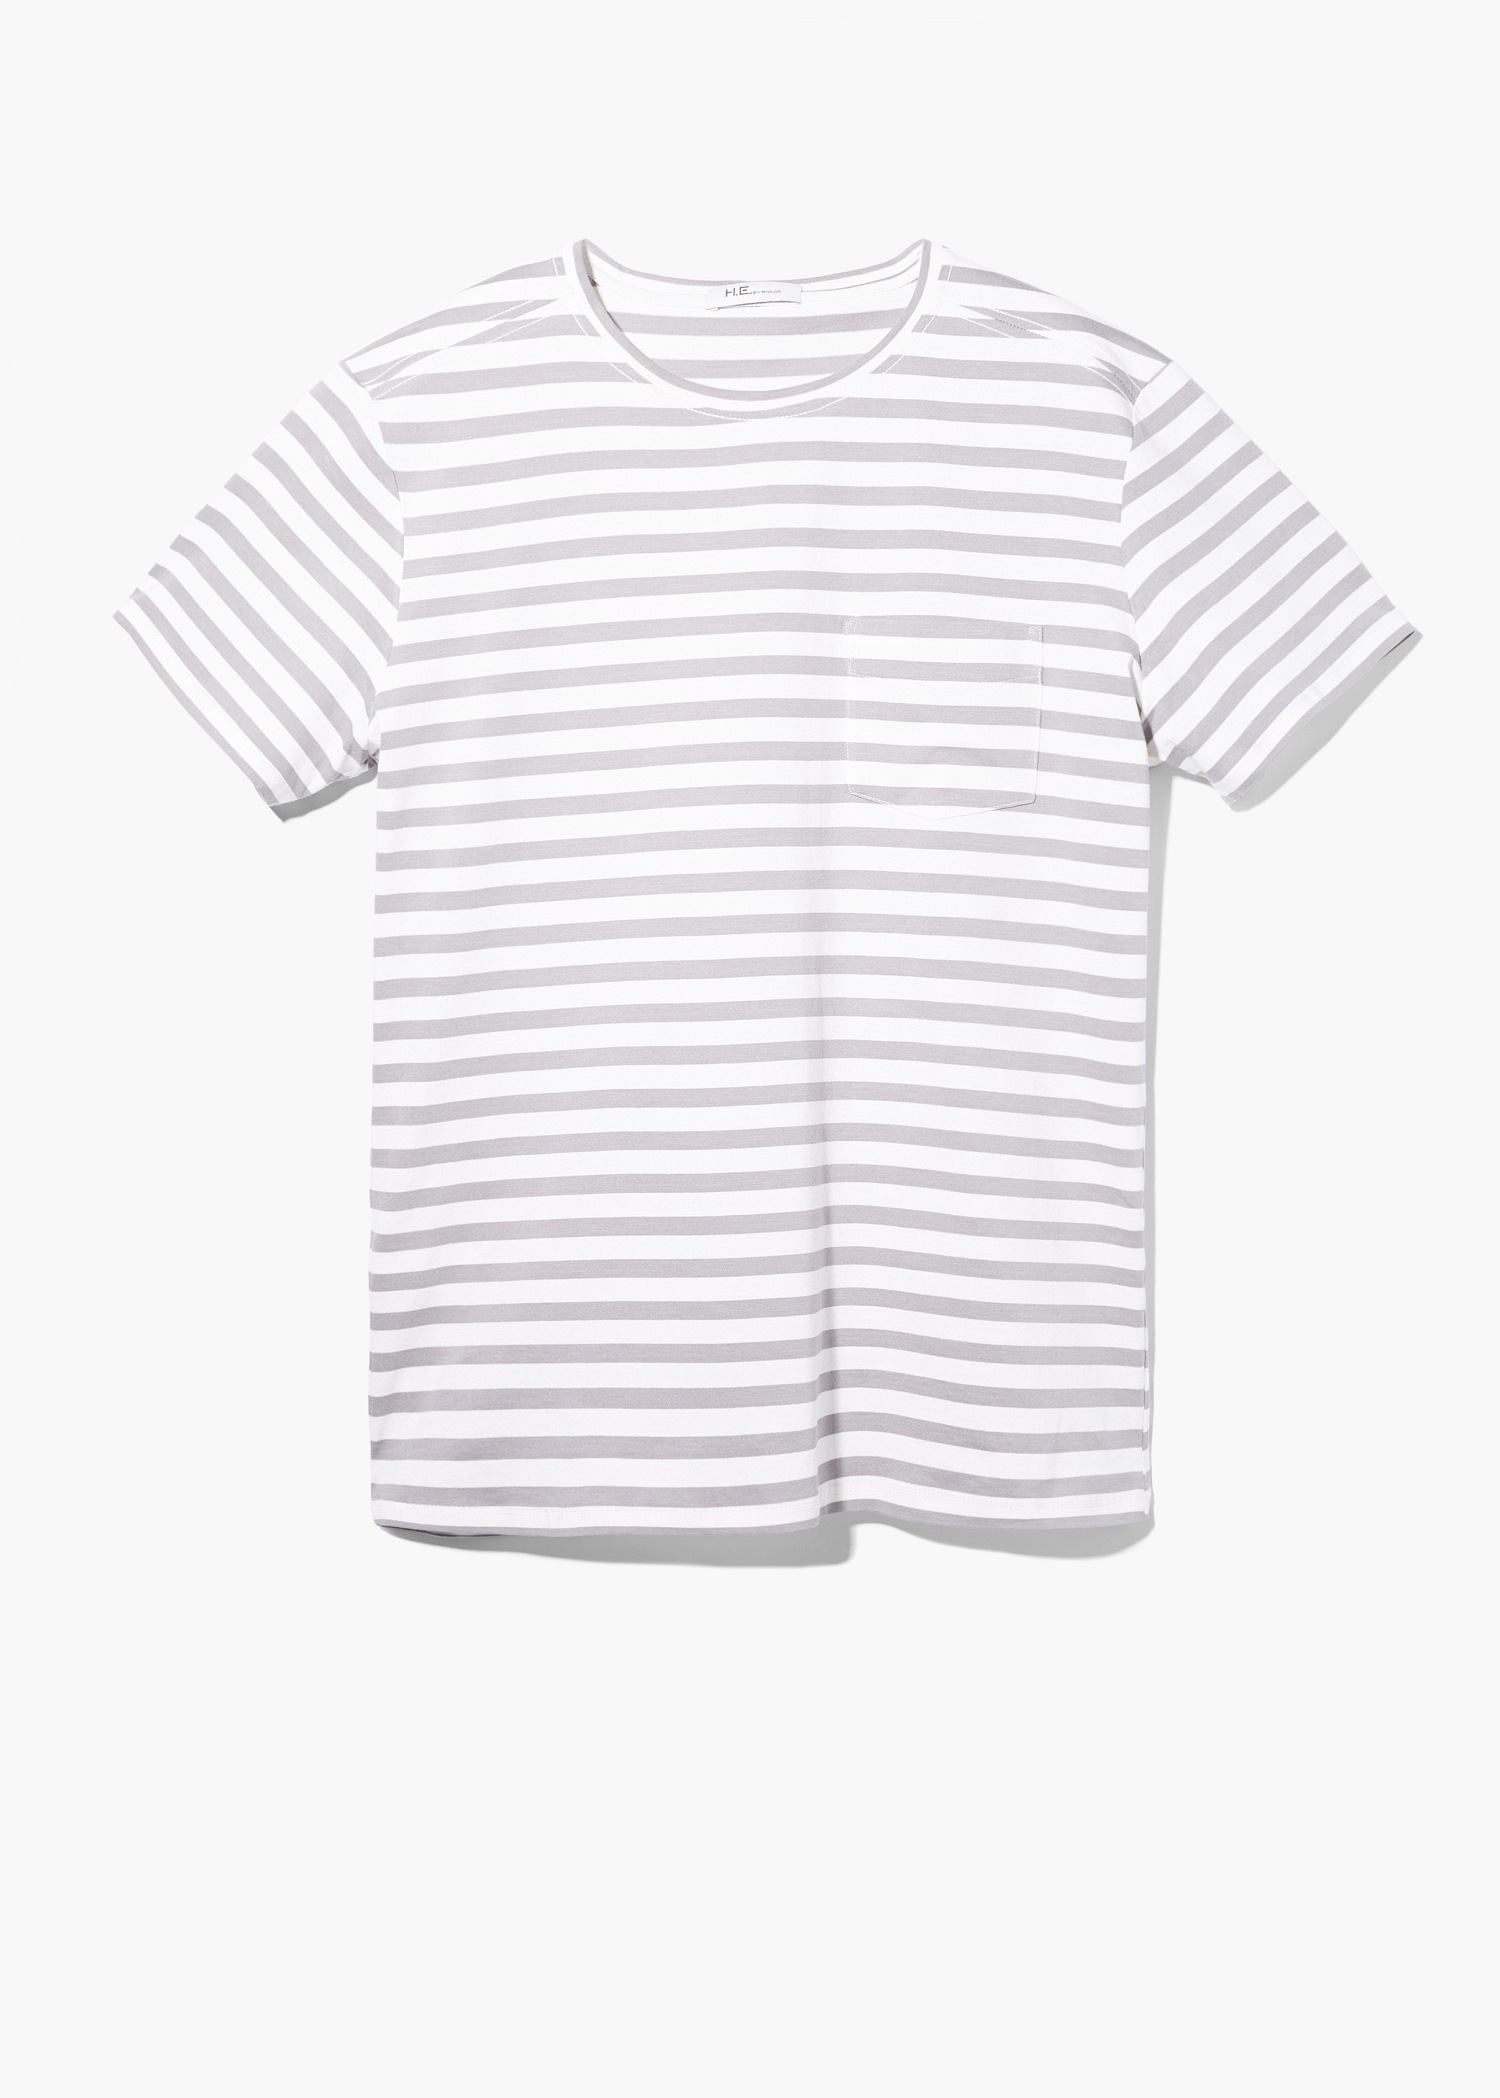 Lyst mango striped t shirt in gray for men Grey striped t shirt